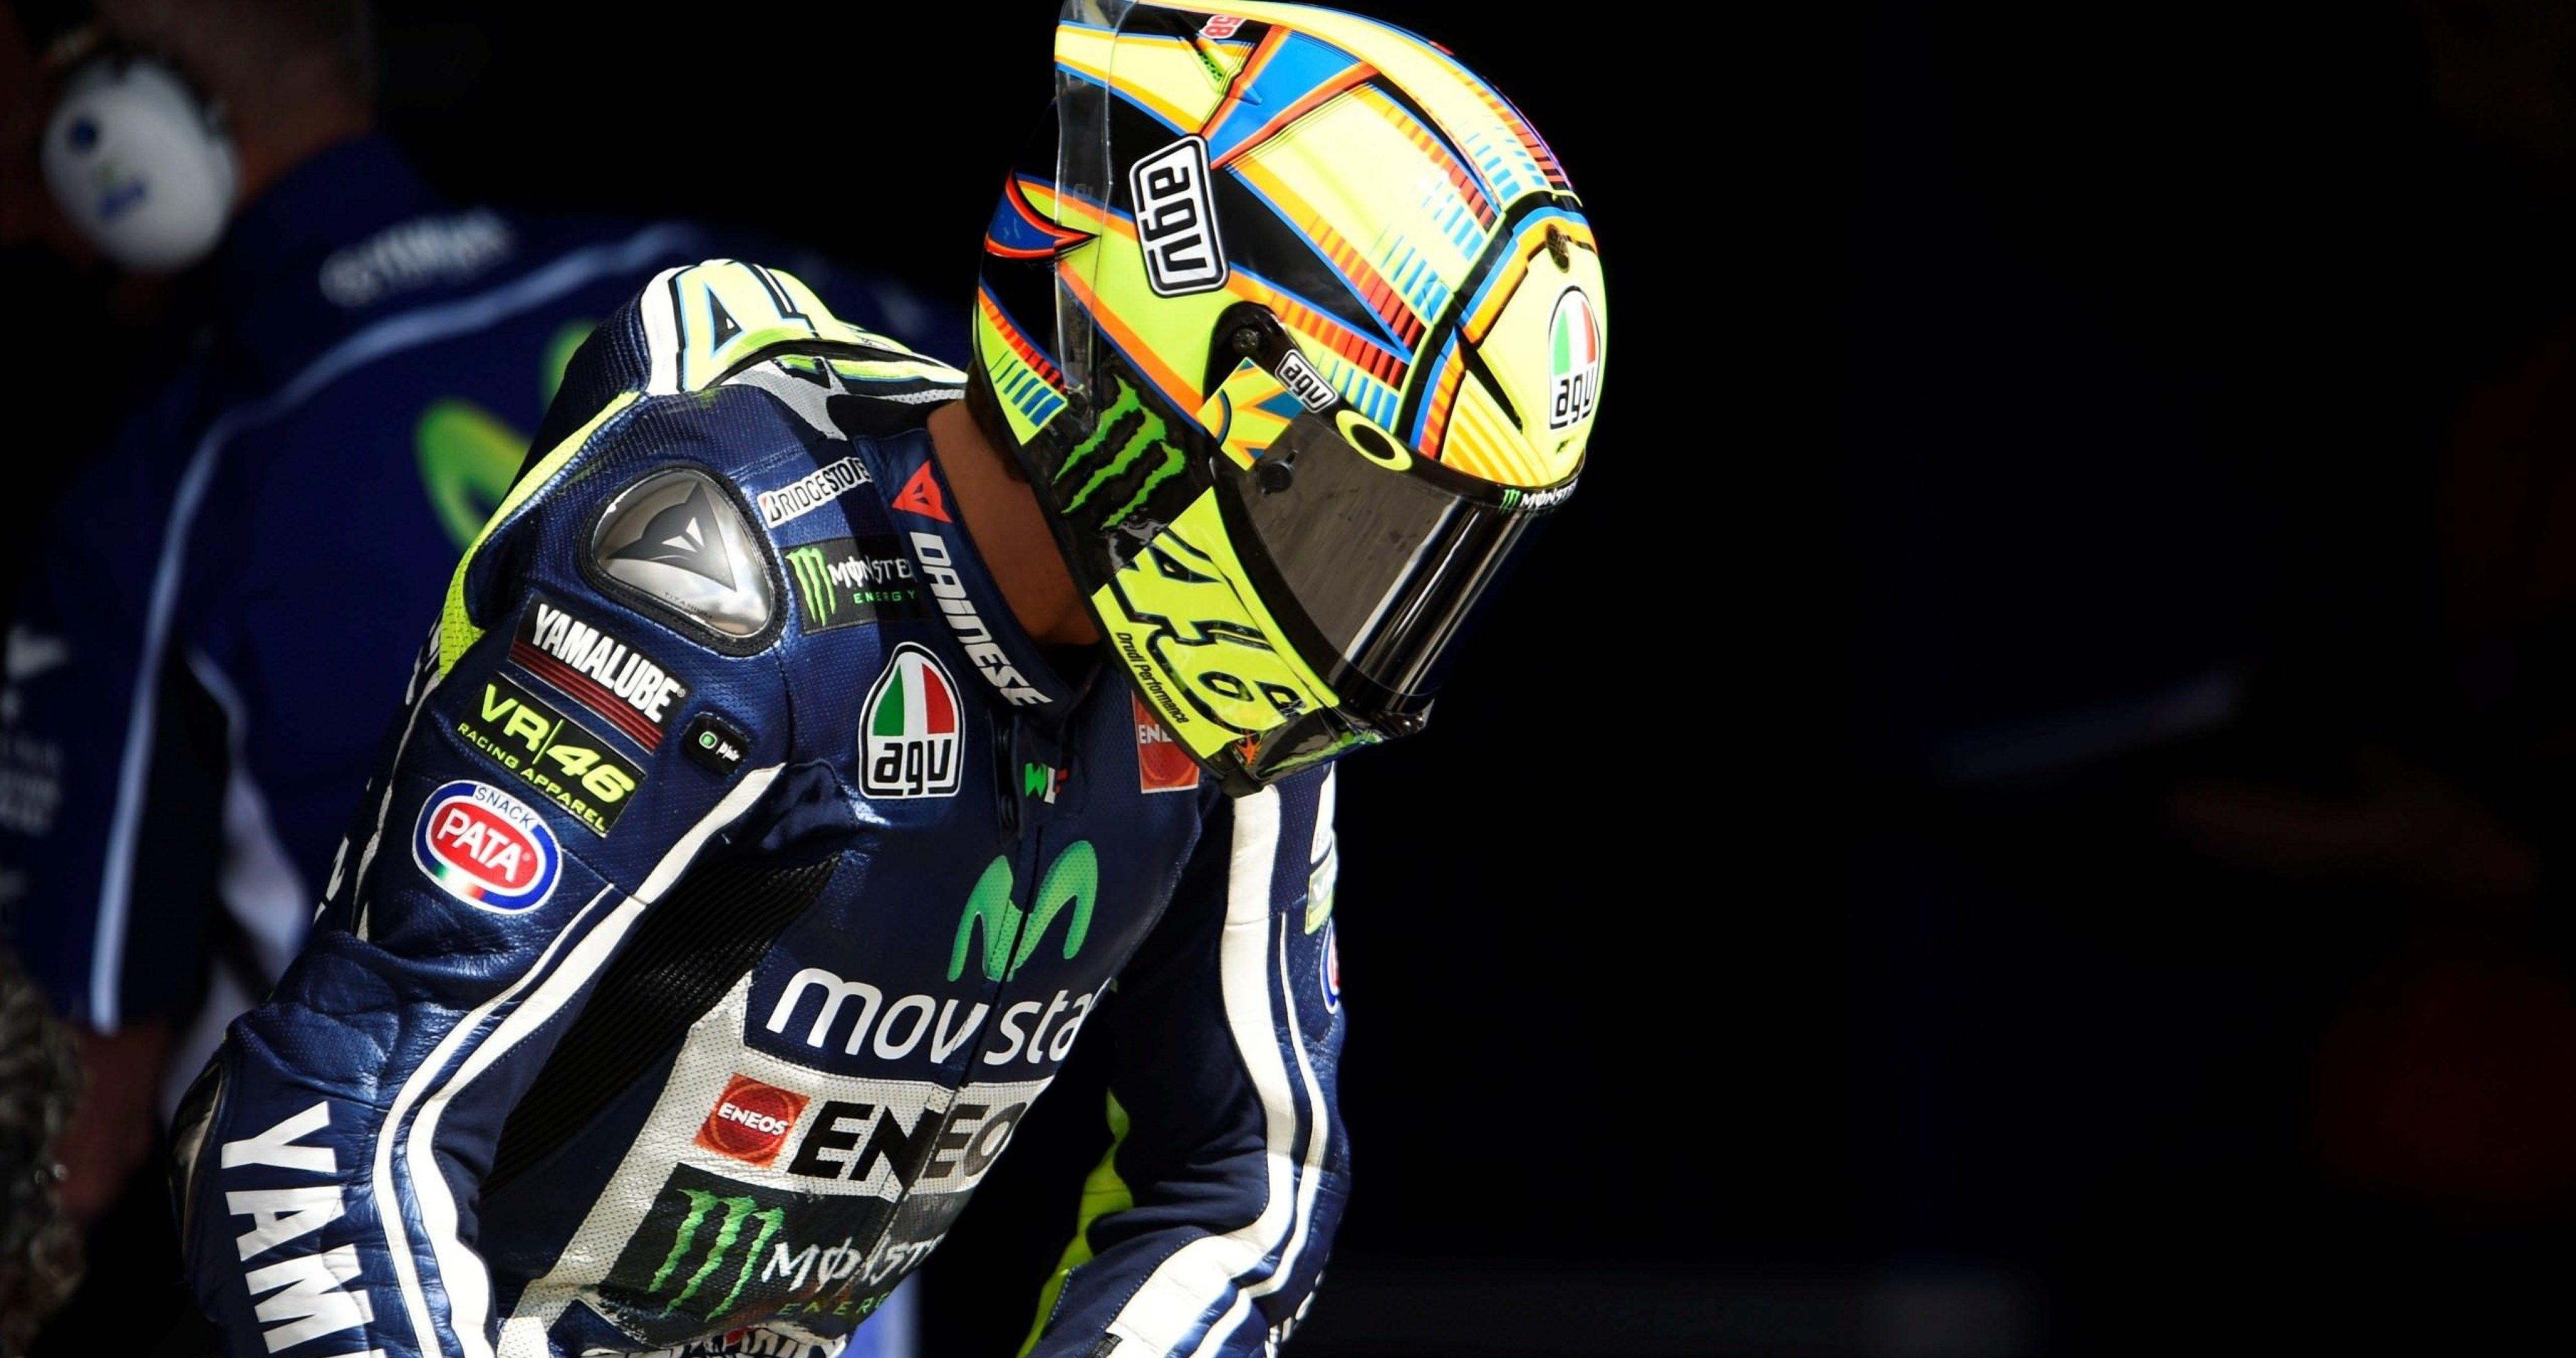 Valentino Rossi The Doctor 4K Ultra Hd Wallpaper -6181